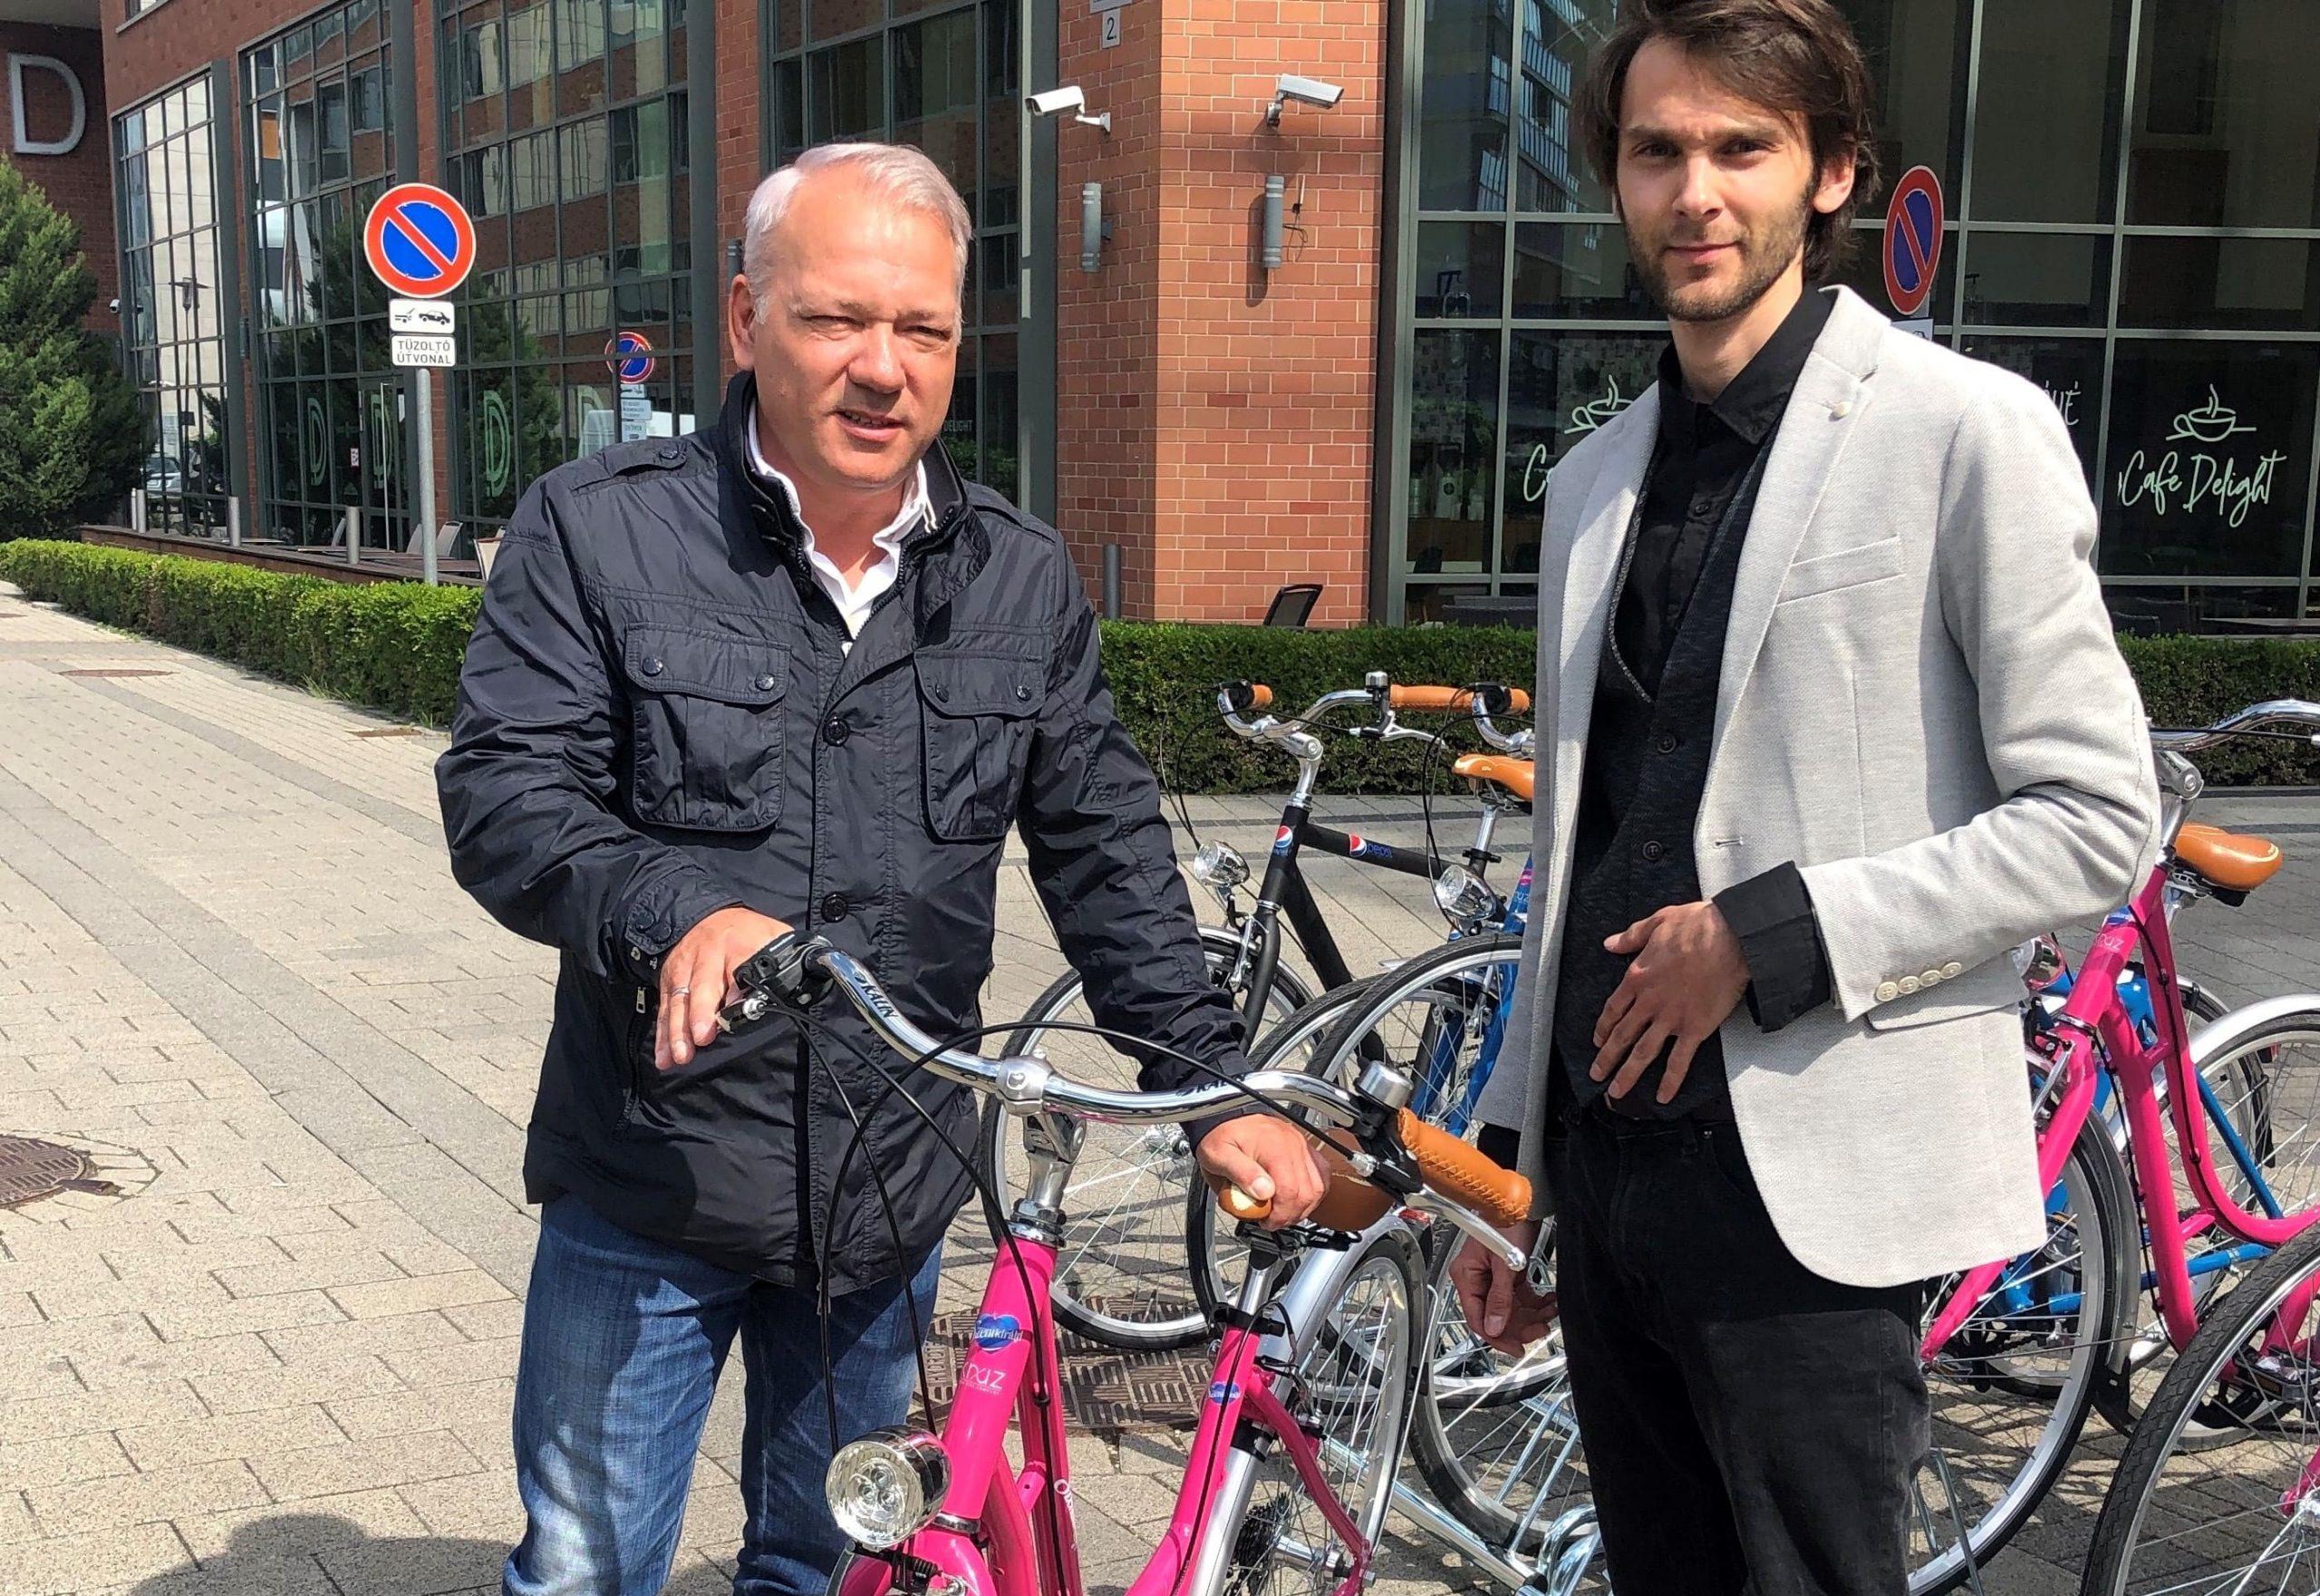 Szentkiralyi_Magyarorszag_Kruz_Bike_bicikliflotta_20200617 (2)